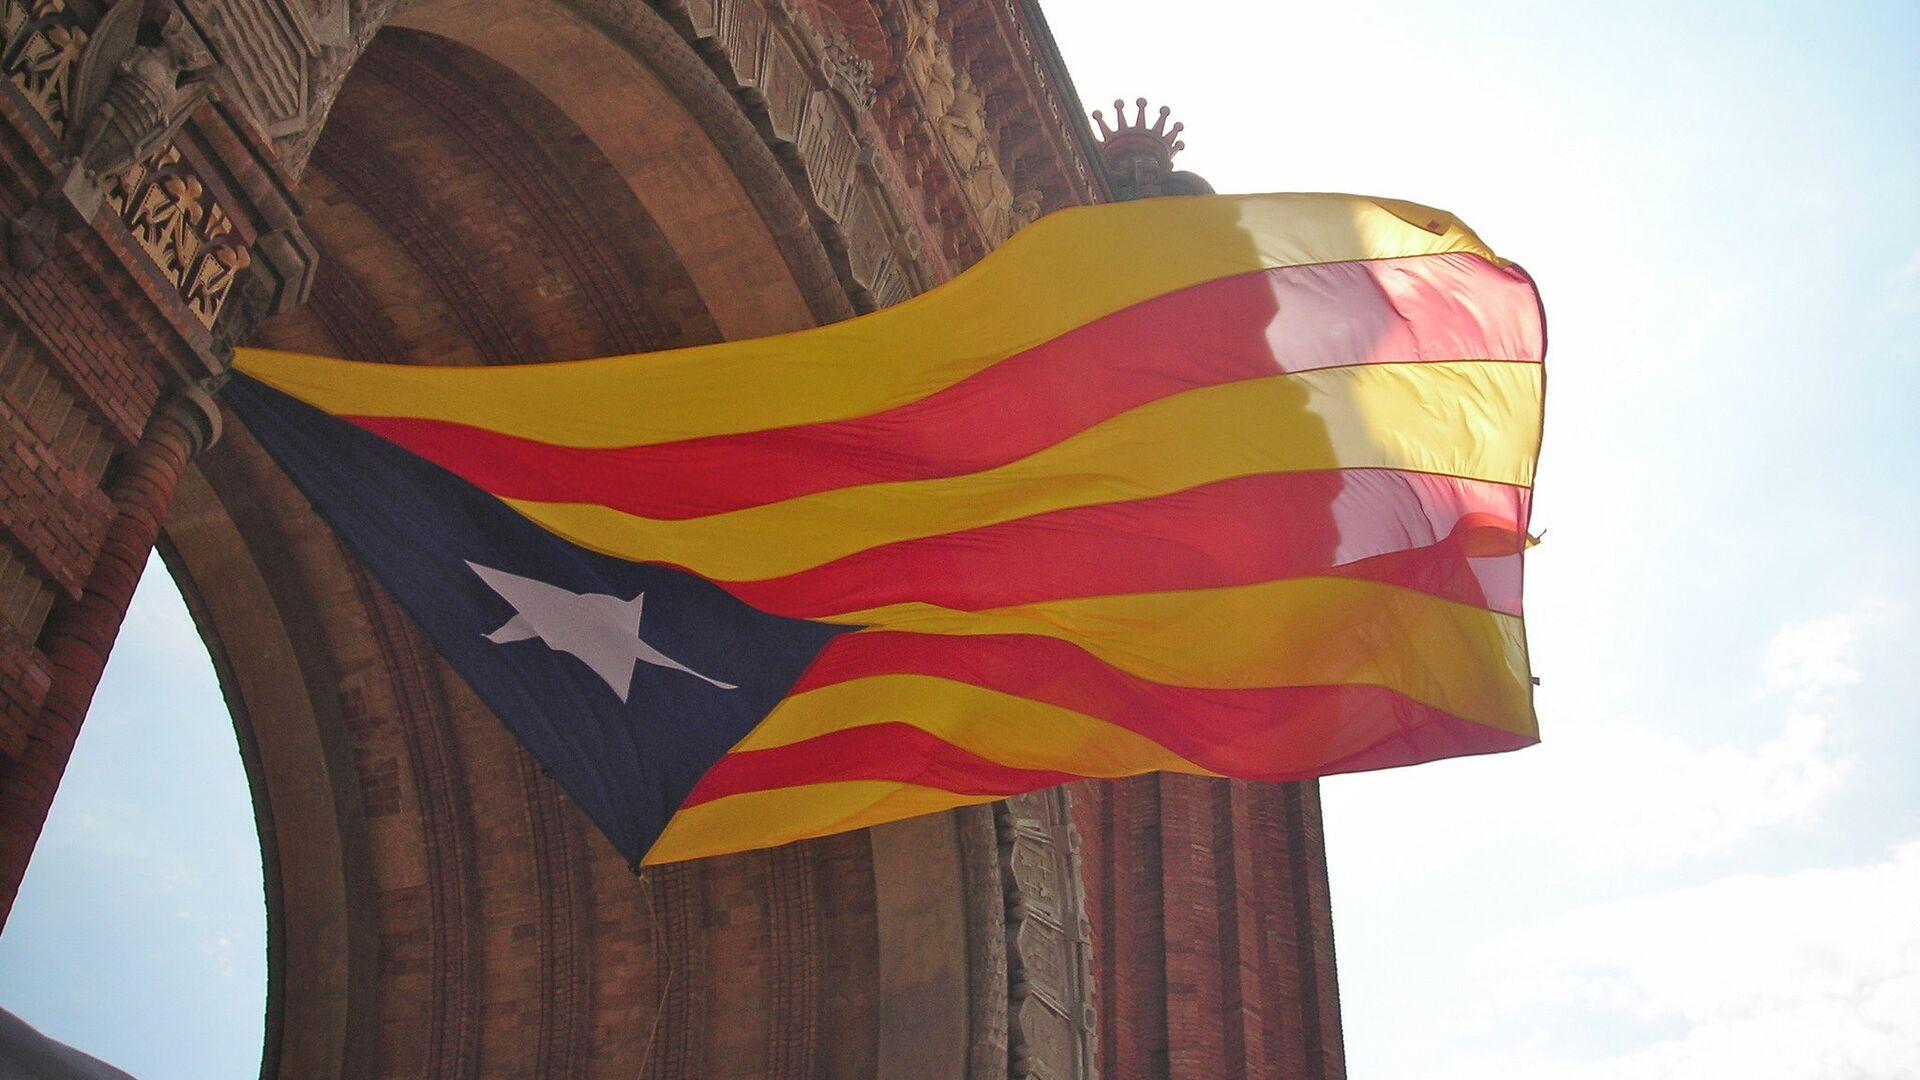 Estelada, la bandera independentista de Cataluña - Sputnik Mundo, 1920, 07.02.2021